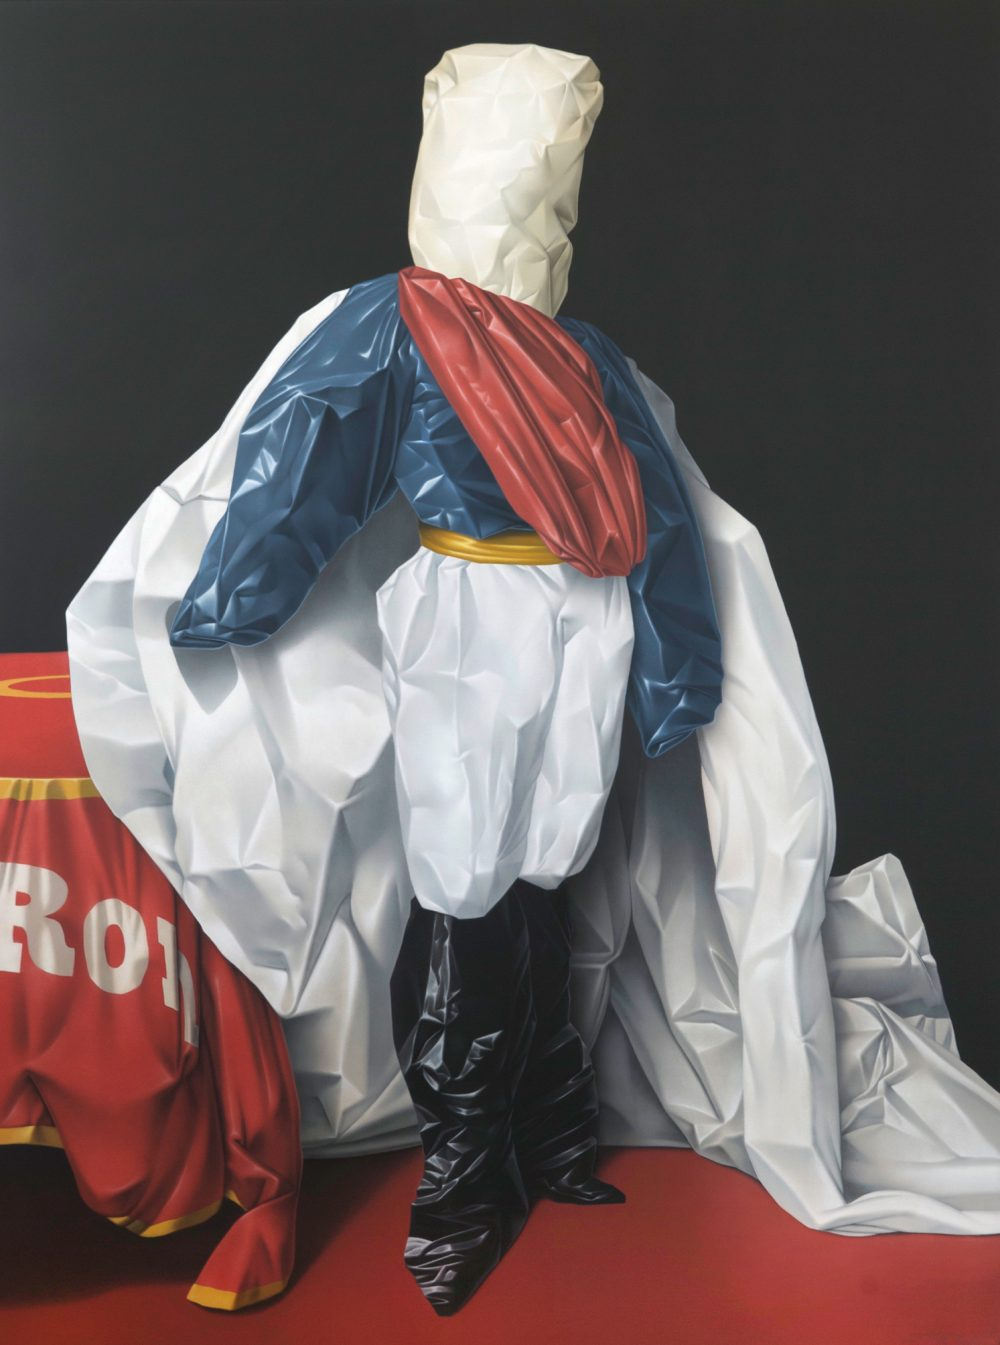 Lord (2010), Acryl auf Leinwand, 200 x 150 cm